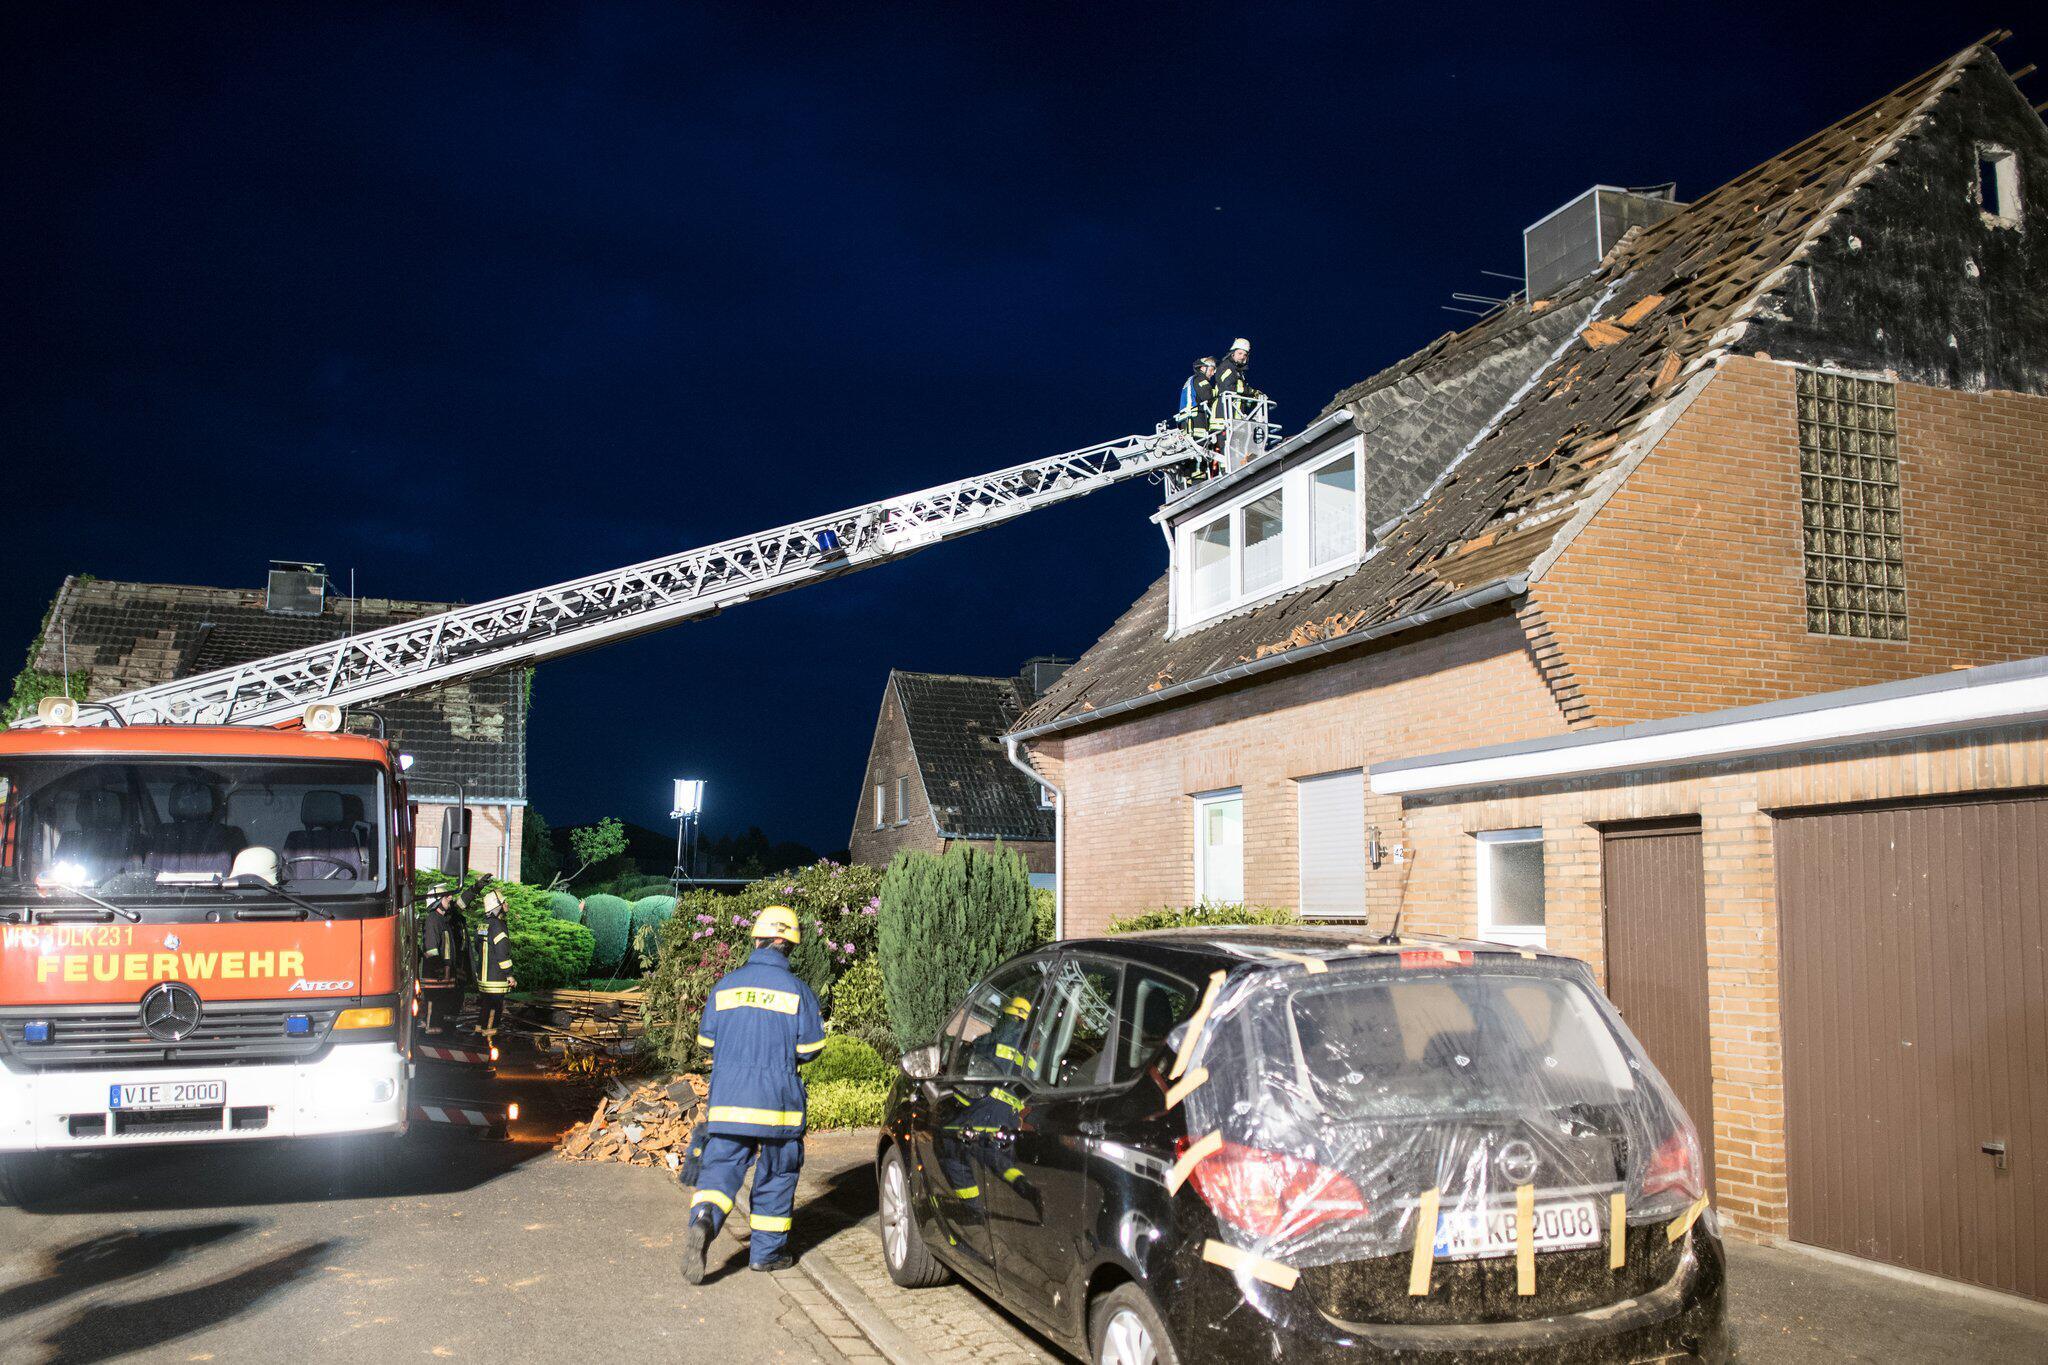 Bild zu Tornado in the lower Rhine region